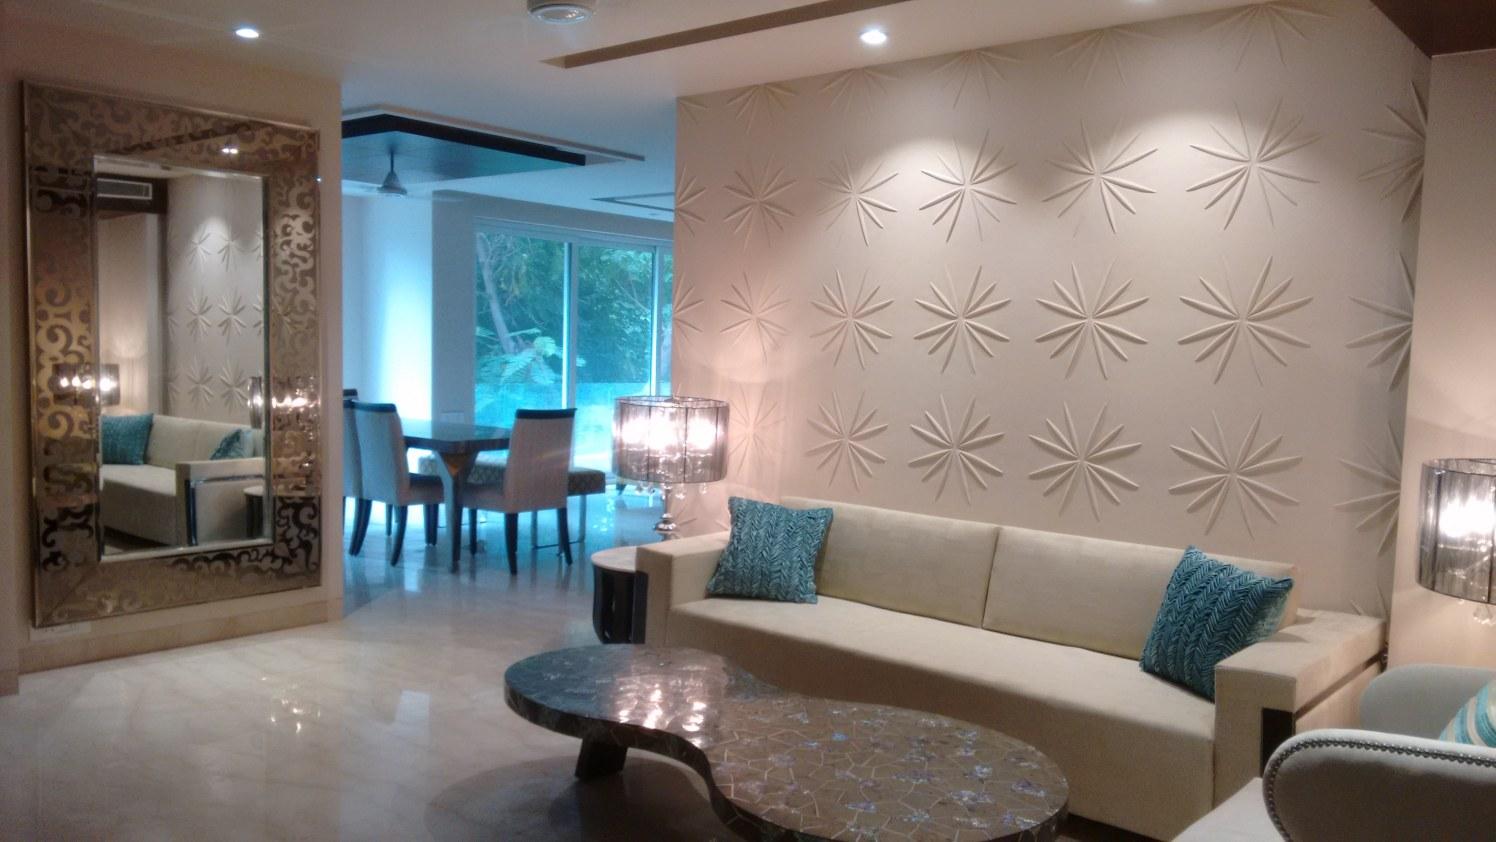 The Summer House by Rupali Kumar Living-room Contemporary | Interior Design Photos & Ideas